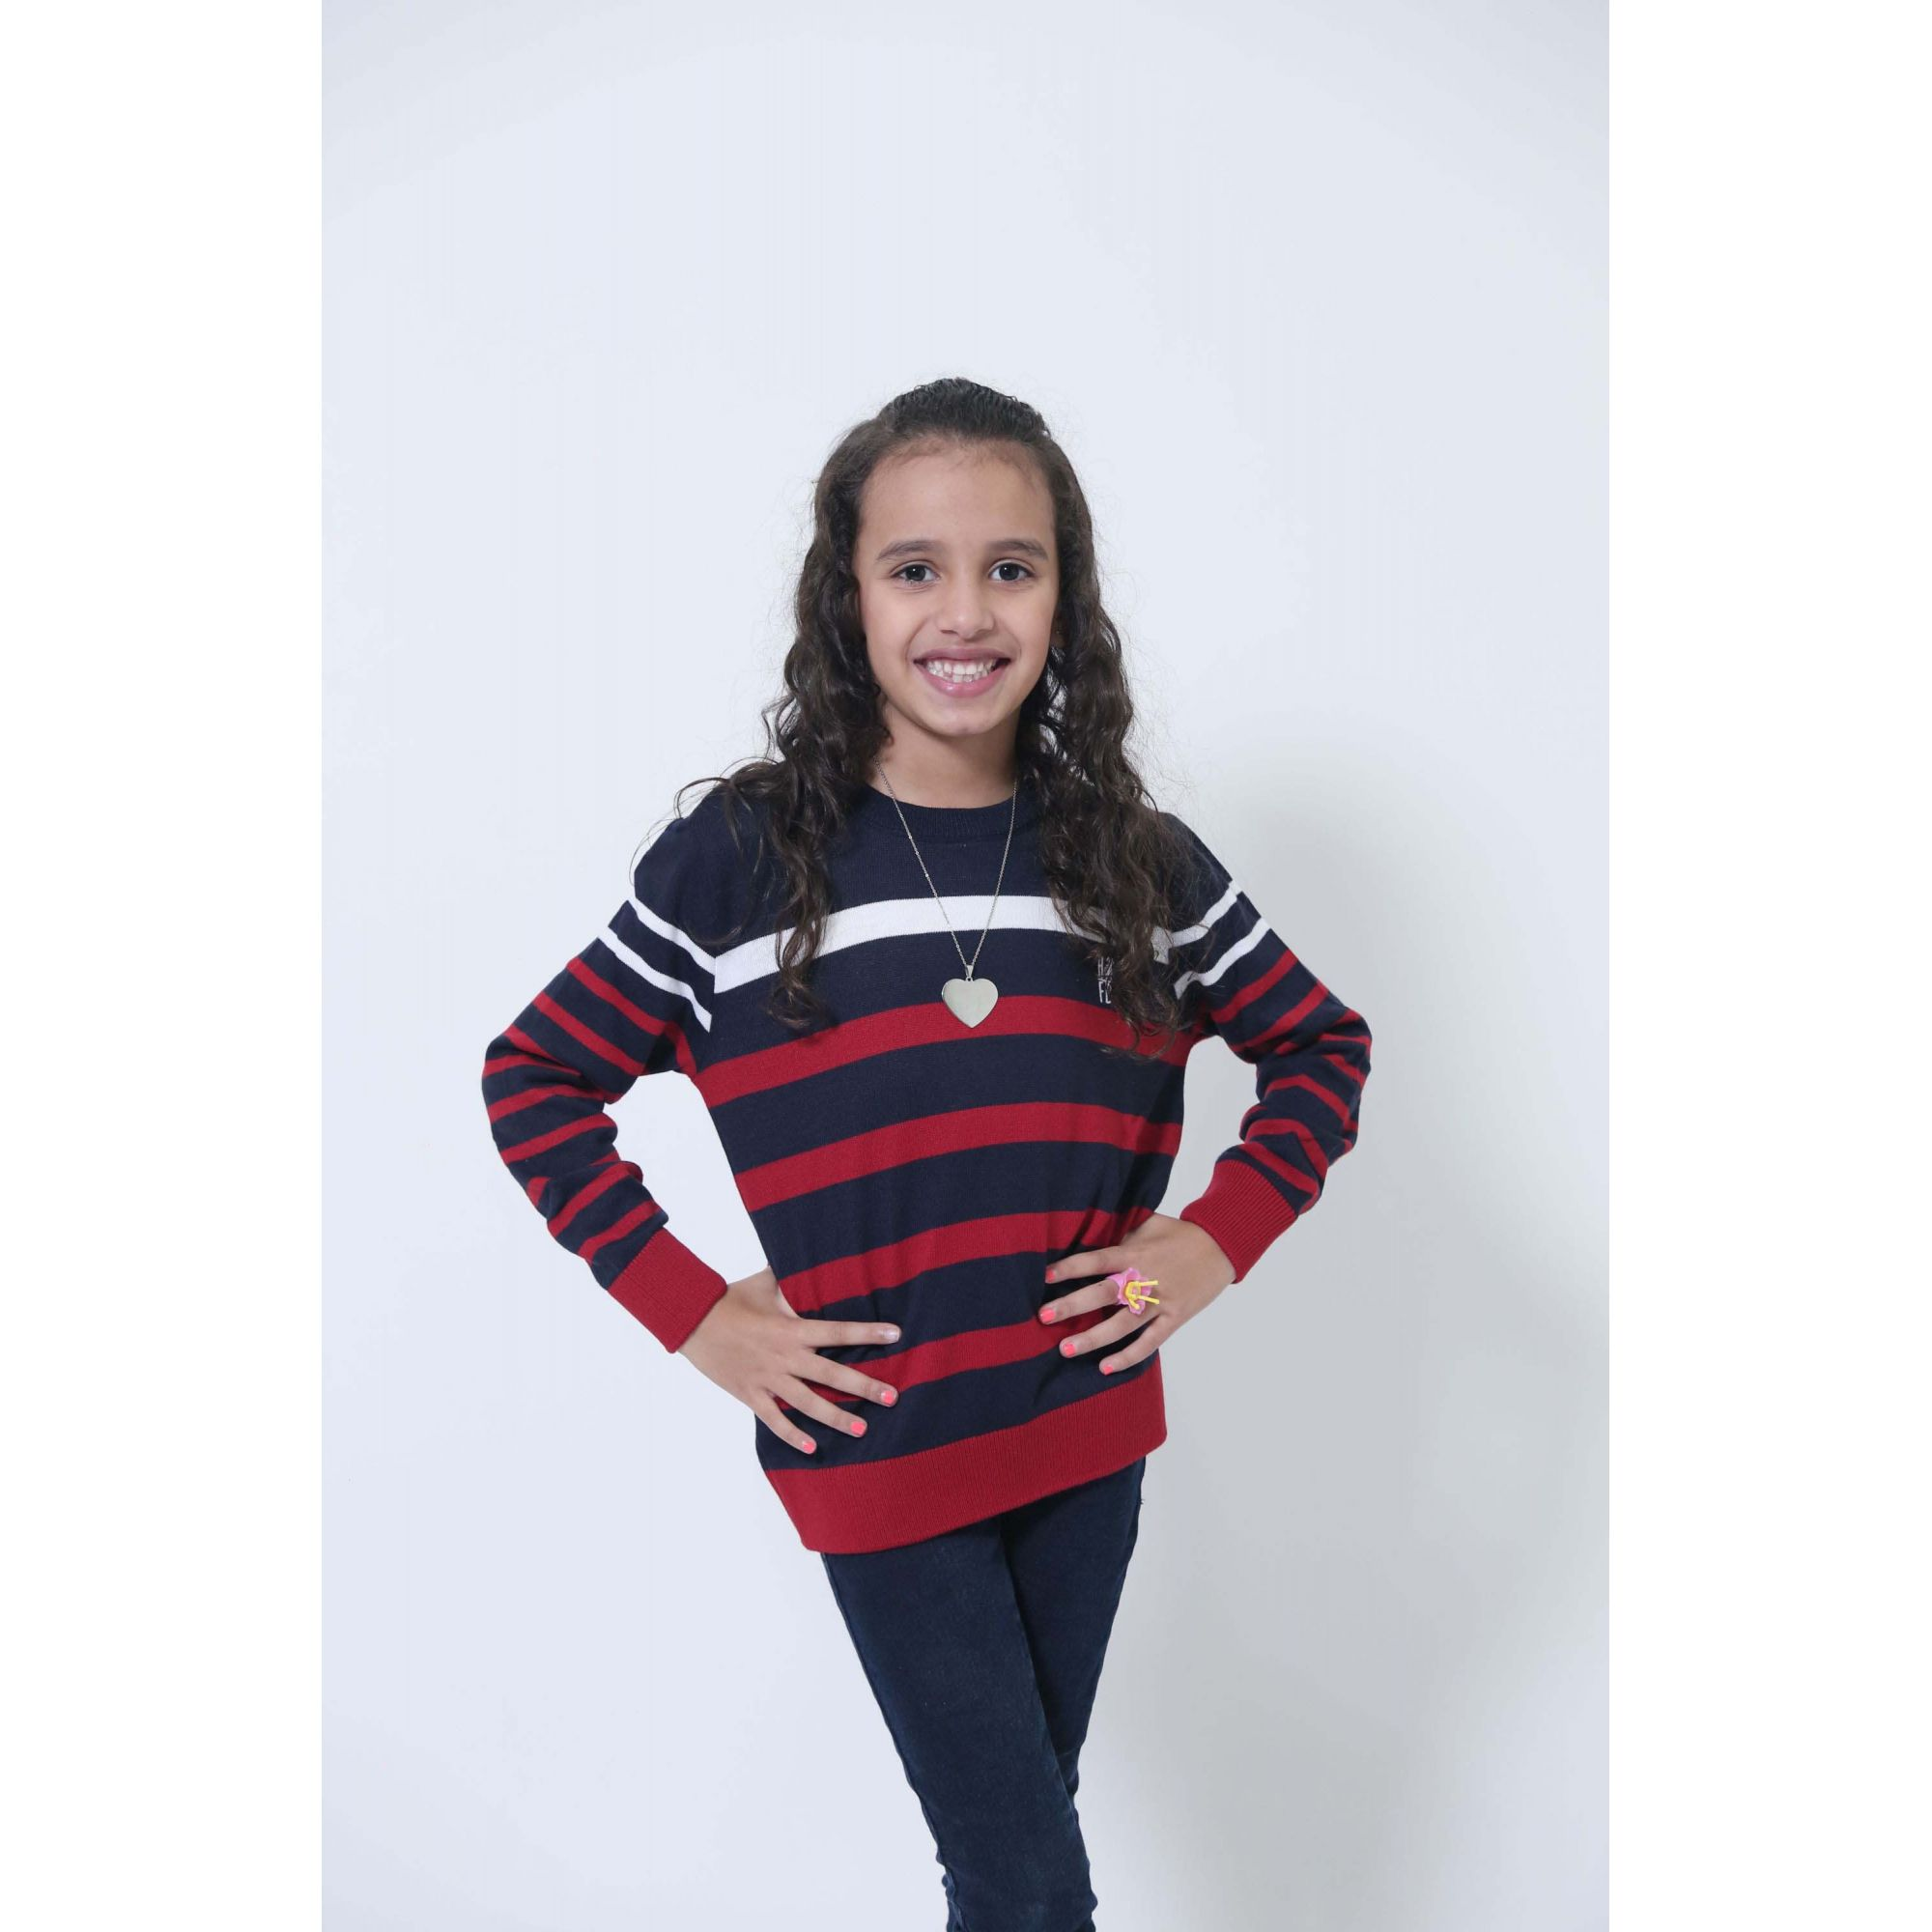 MÃE E FILHA > Kit 02 Blusas Suéter Listrado [Coleção Tal Mãe Tal Filha]  - Heitor Fashion Brazil